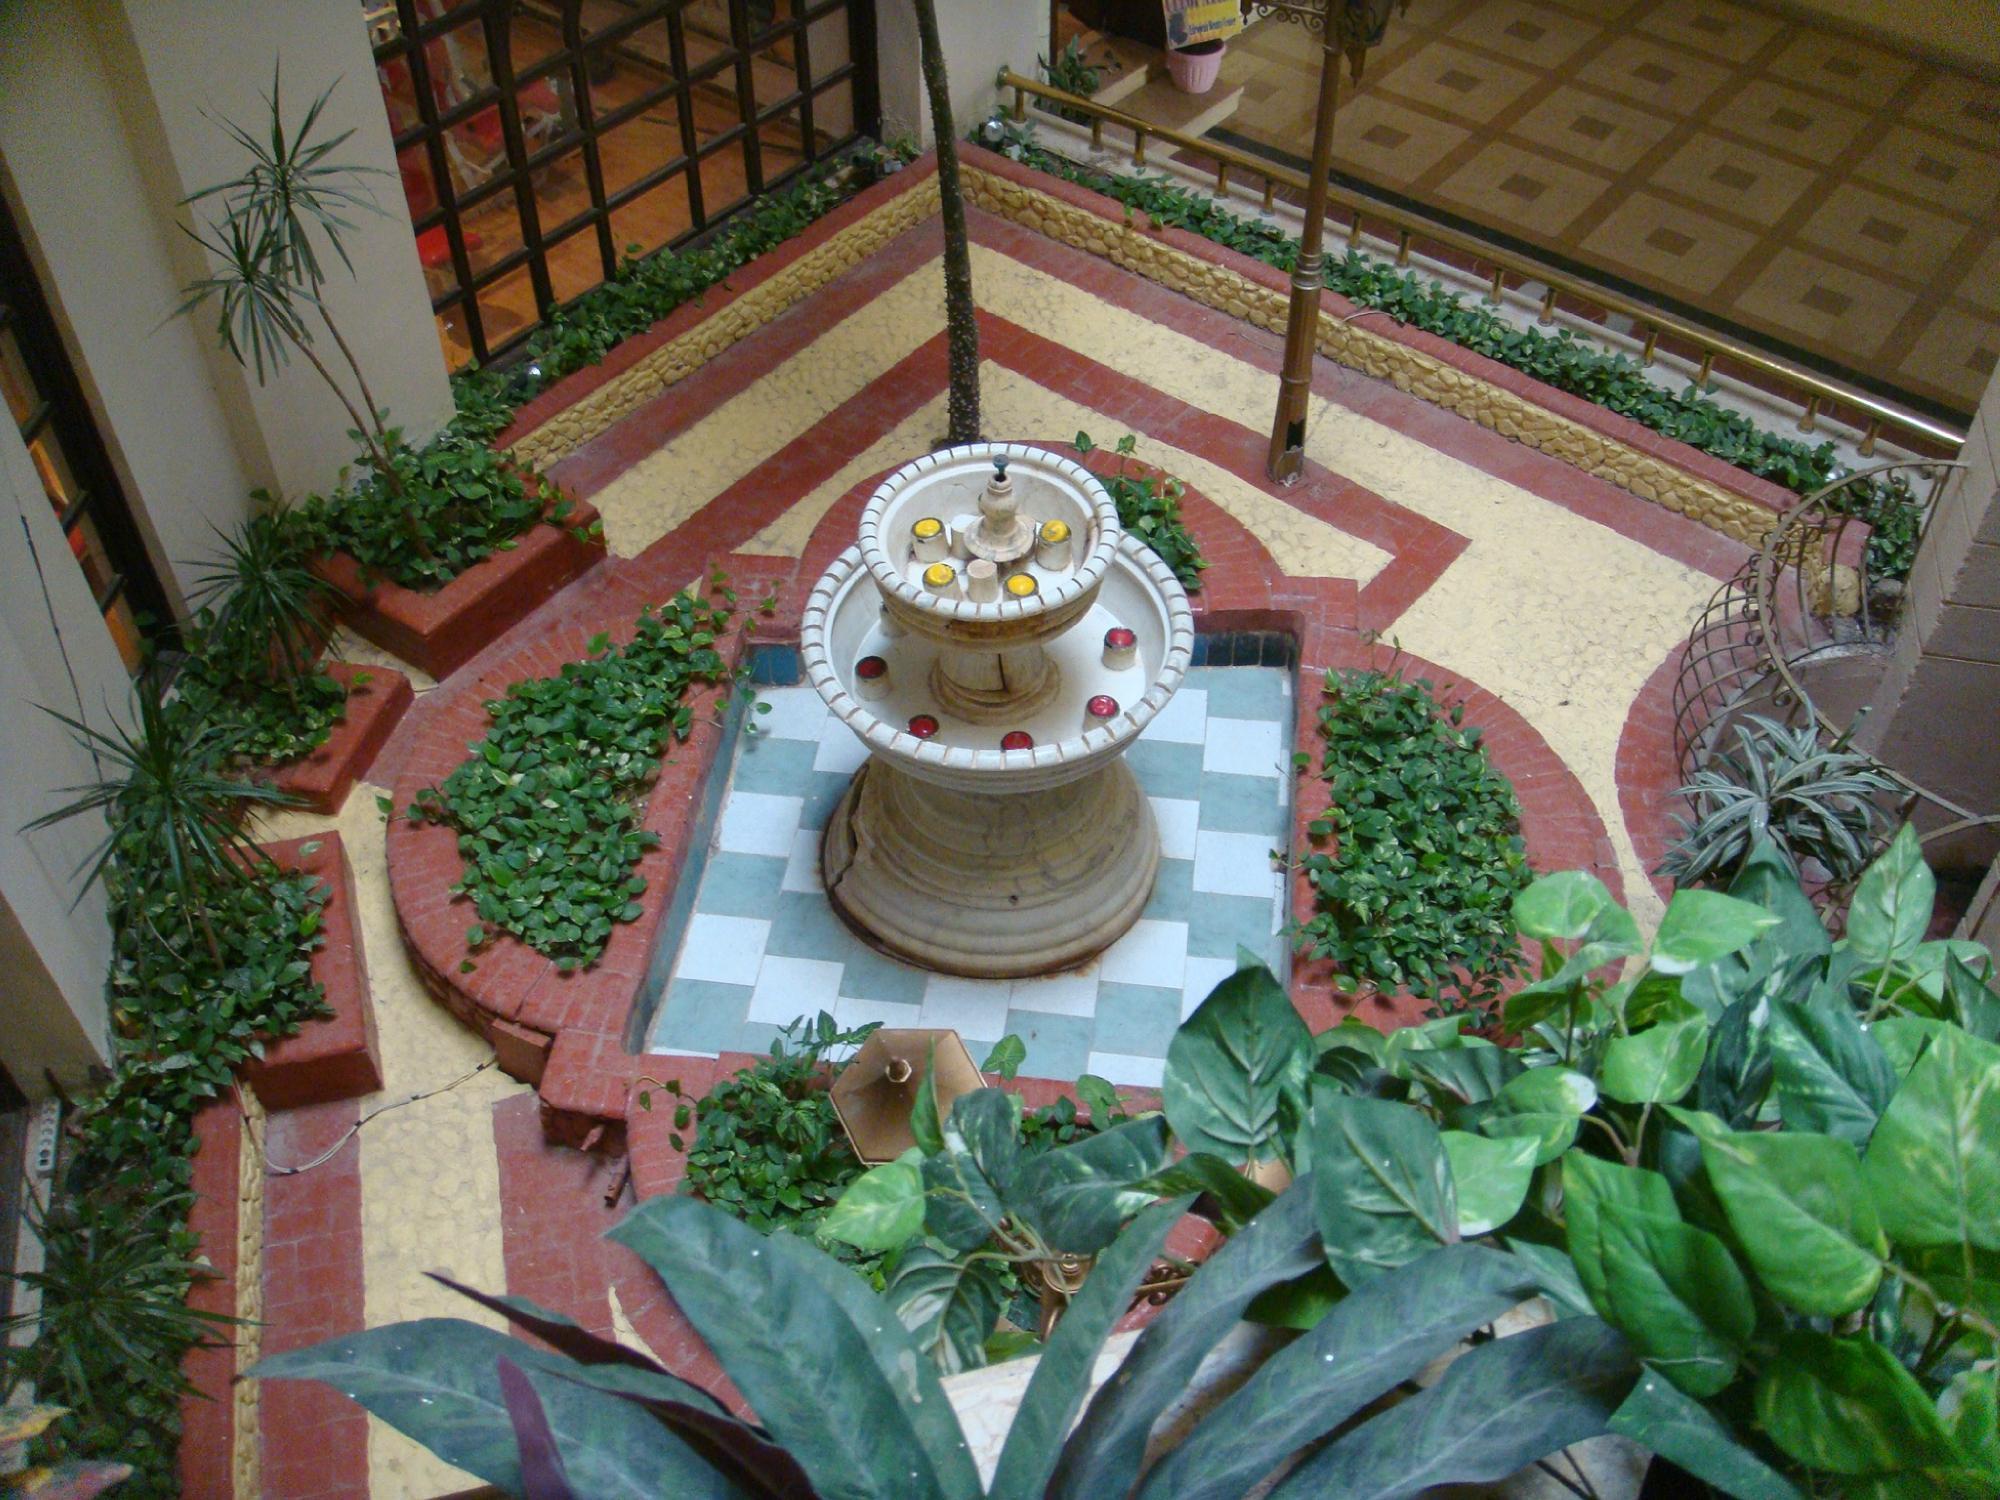 roma-host-way-hotel-aqua-park-genel-003